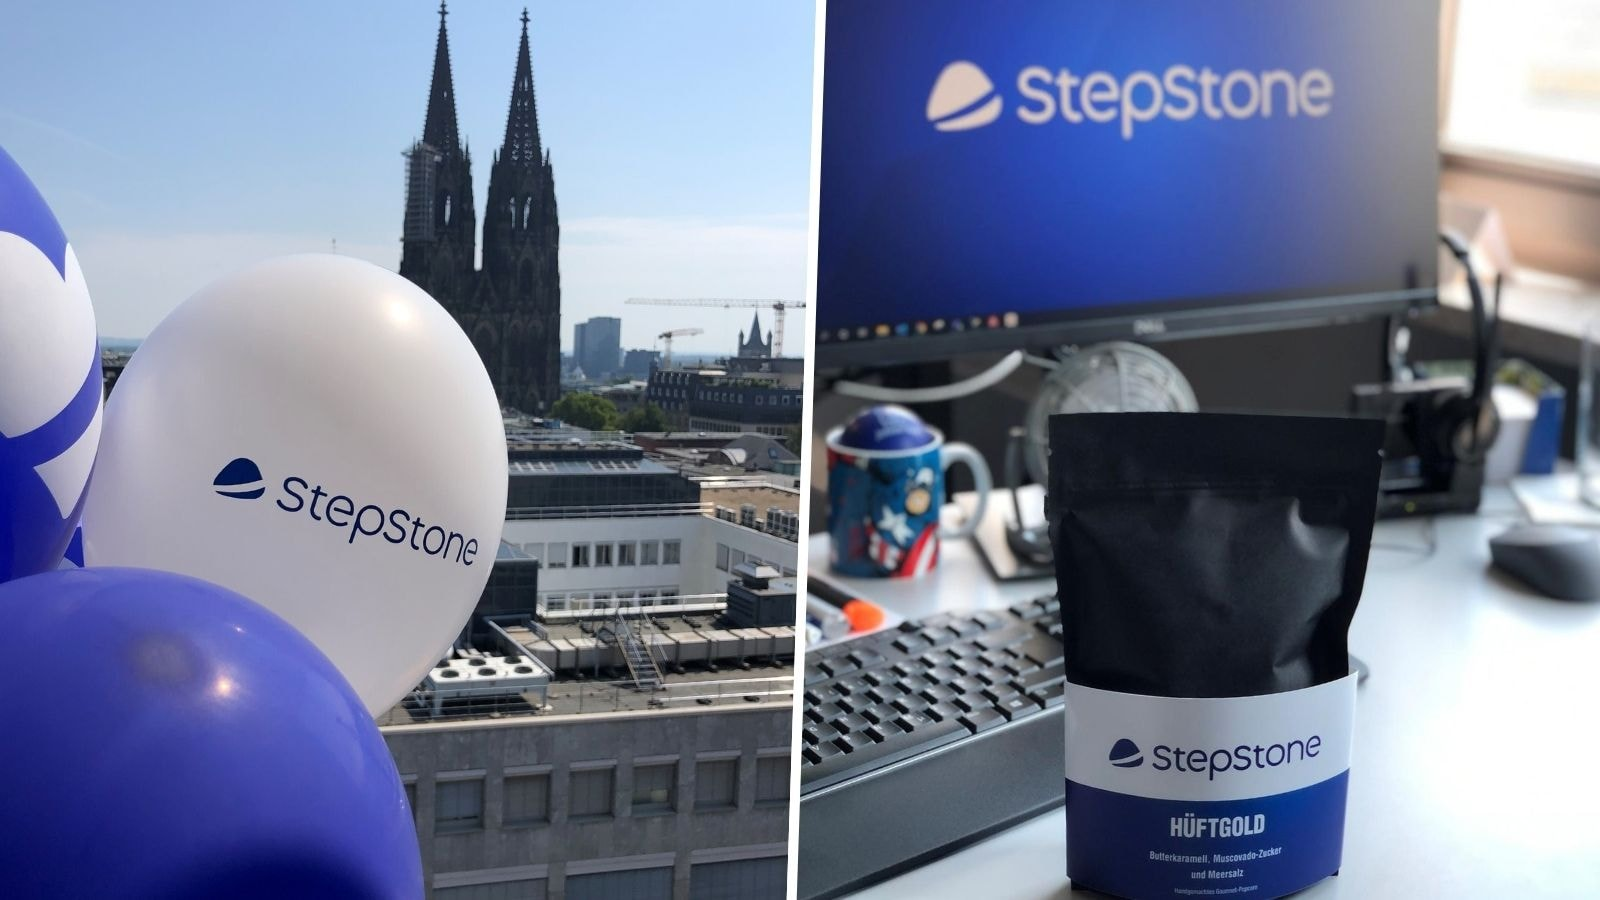 Stepstone Paderborn